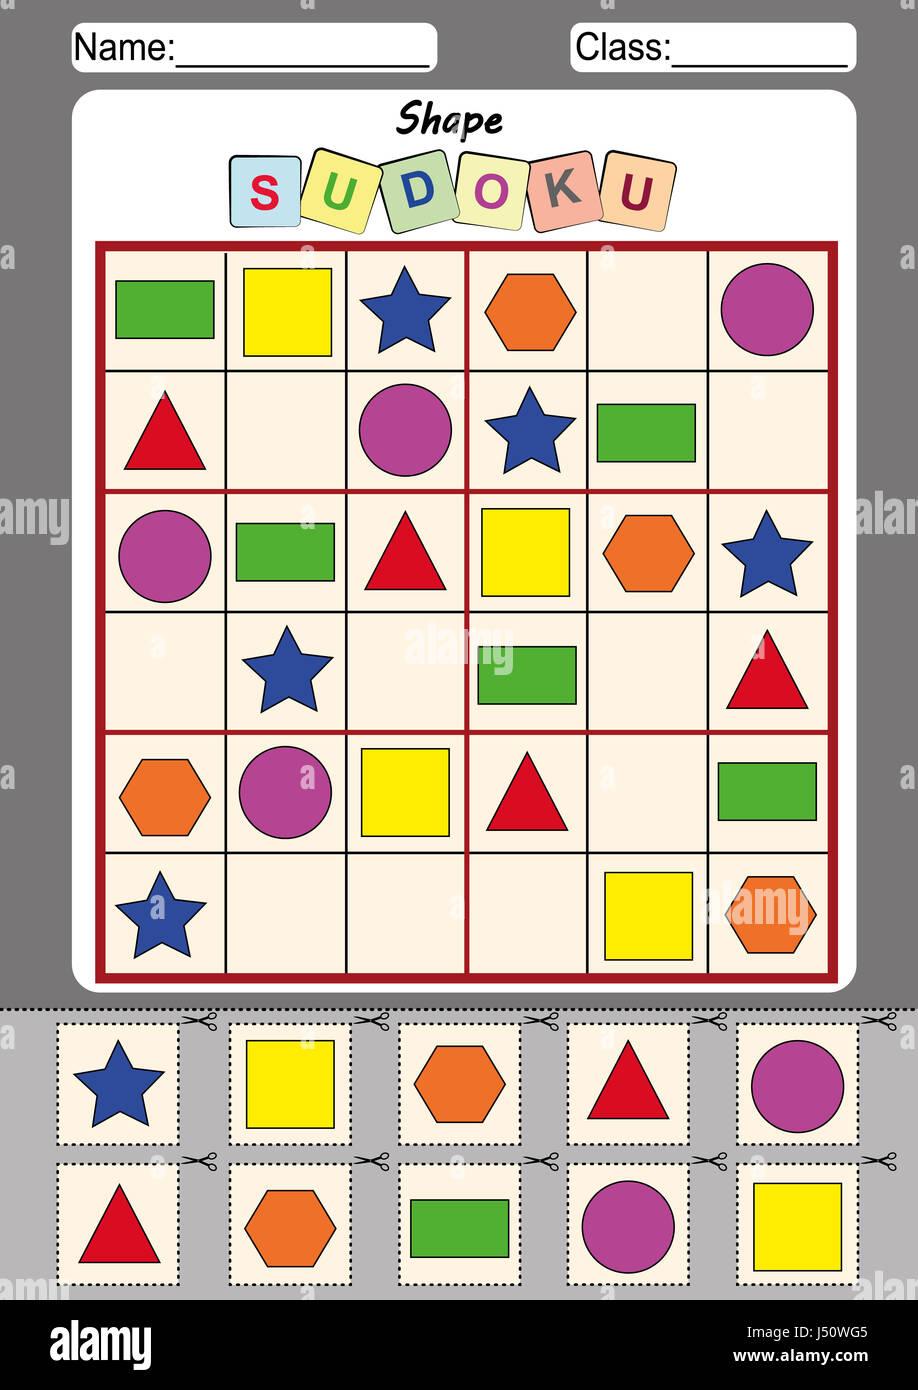 Maze Brain Stockfotos & Maze Brain Bilder - Seite 8 - Alamy